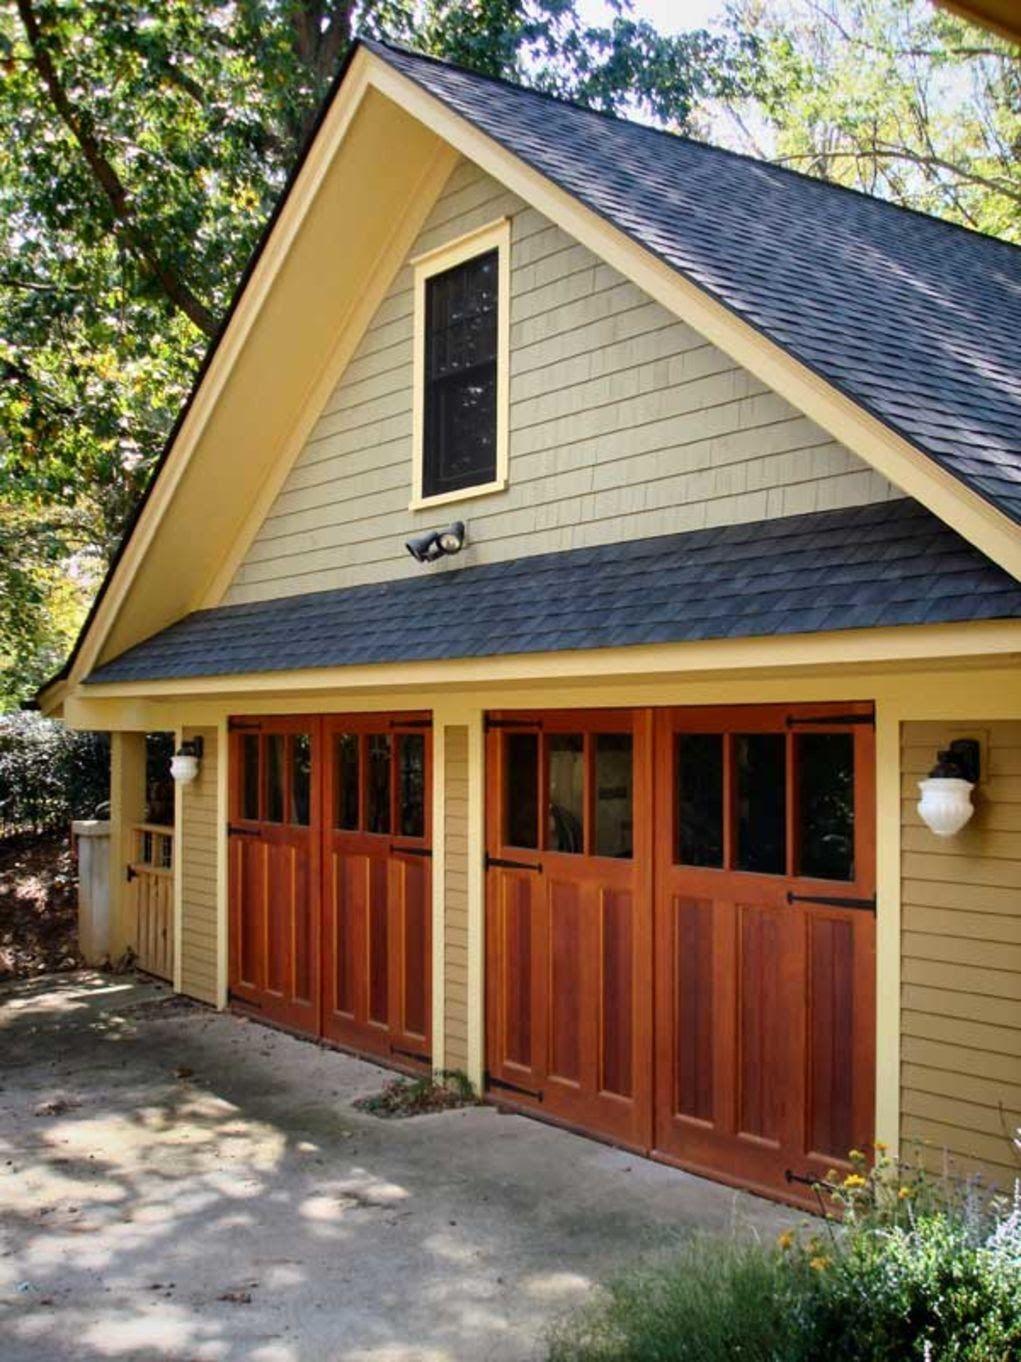 New Garages That Blend In Design For The Arts Crafts House Arts Crafts Homes Online Garage Door Design House Designs Exterior Craftsman House Plans